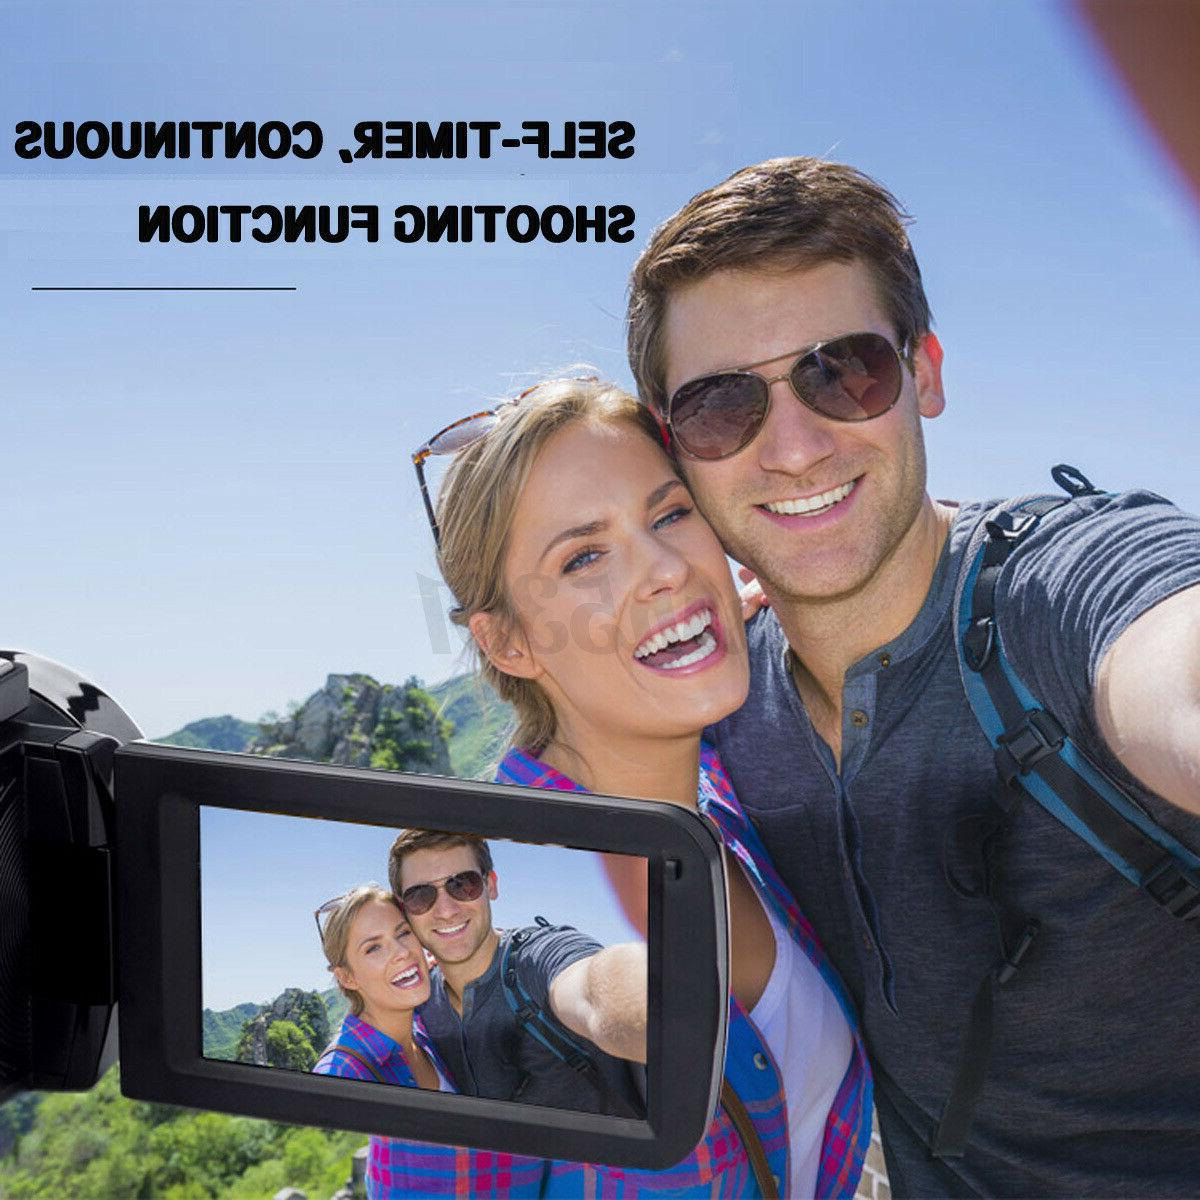 4K WiFi HD Camera Lens Microphone